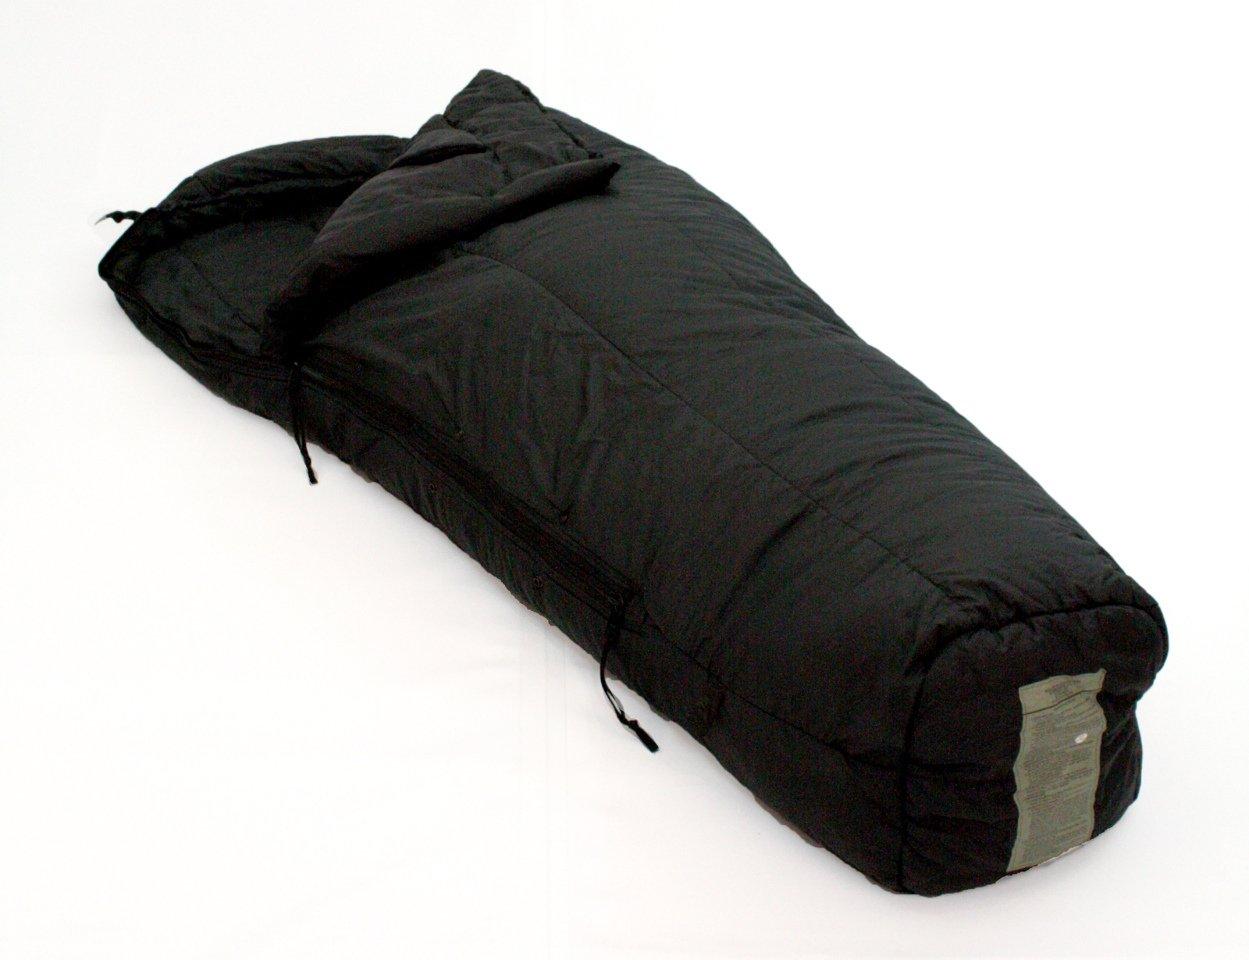 Amazon US Military Modular Sleep System Component 10f Intermediate Sleeping Bag Cold Weather Sports Outdoors